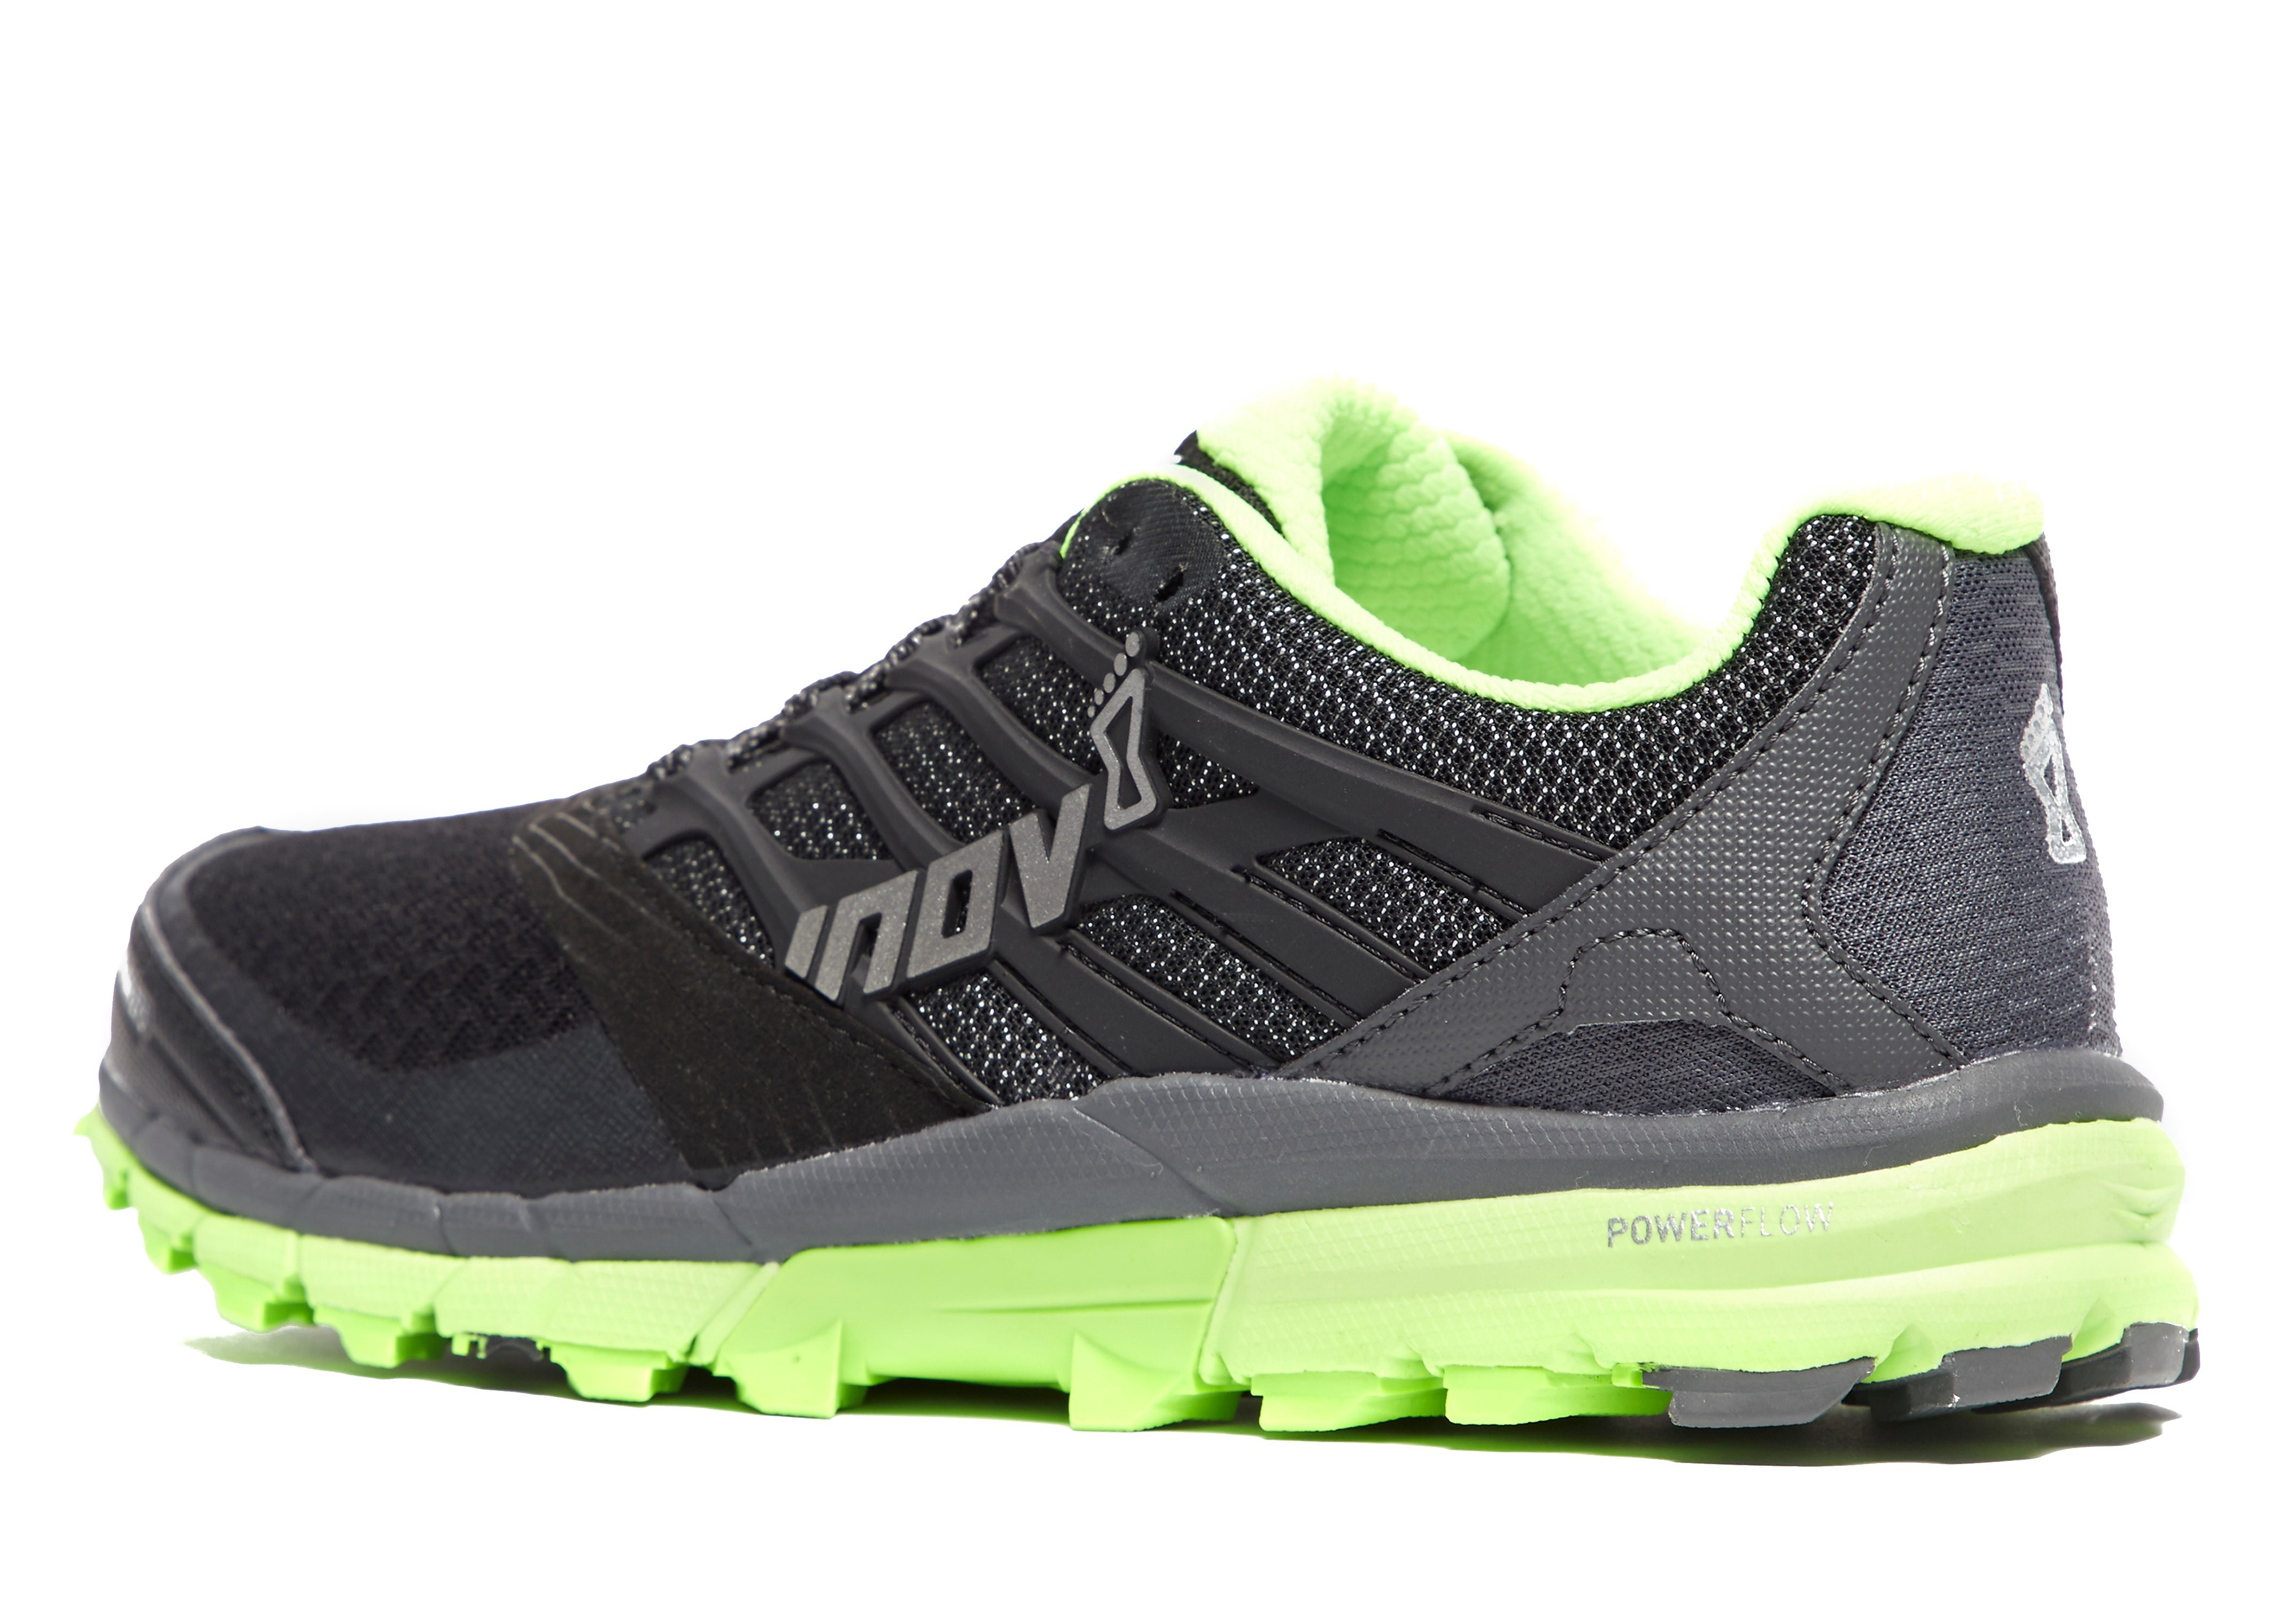 Inov-8 TrailTalon 275 Trail Running Shoes